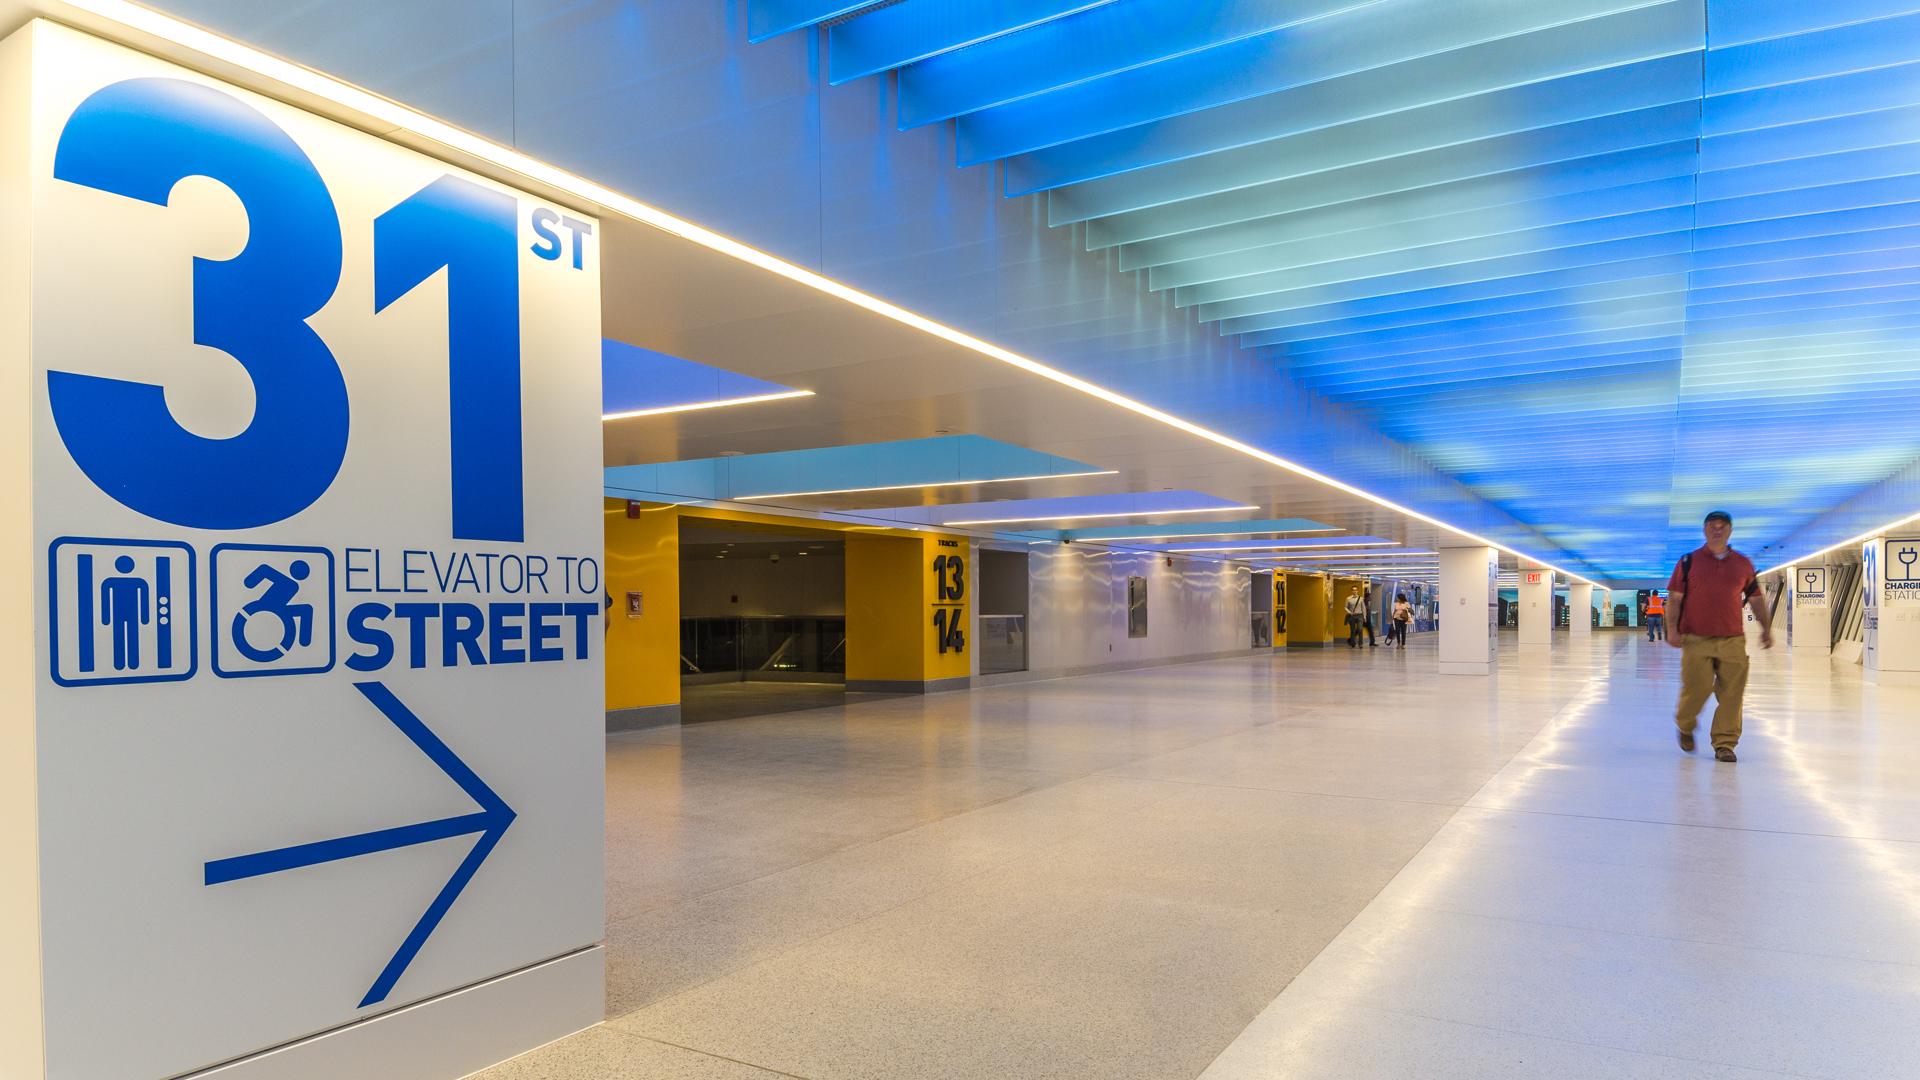 Penn Station New York City | Bespoke lighting manufacture | The Light Lab